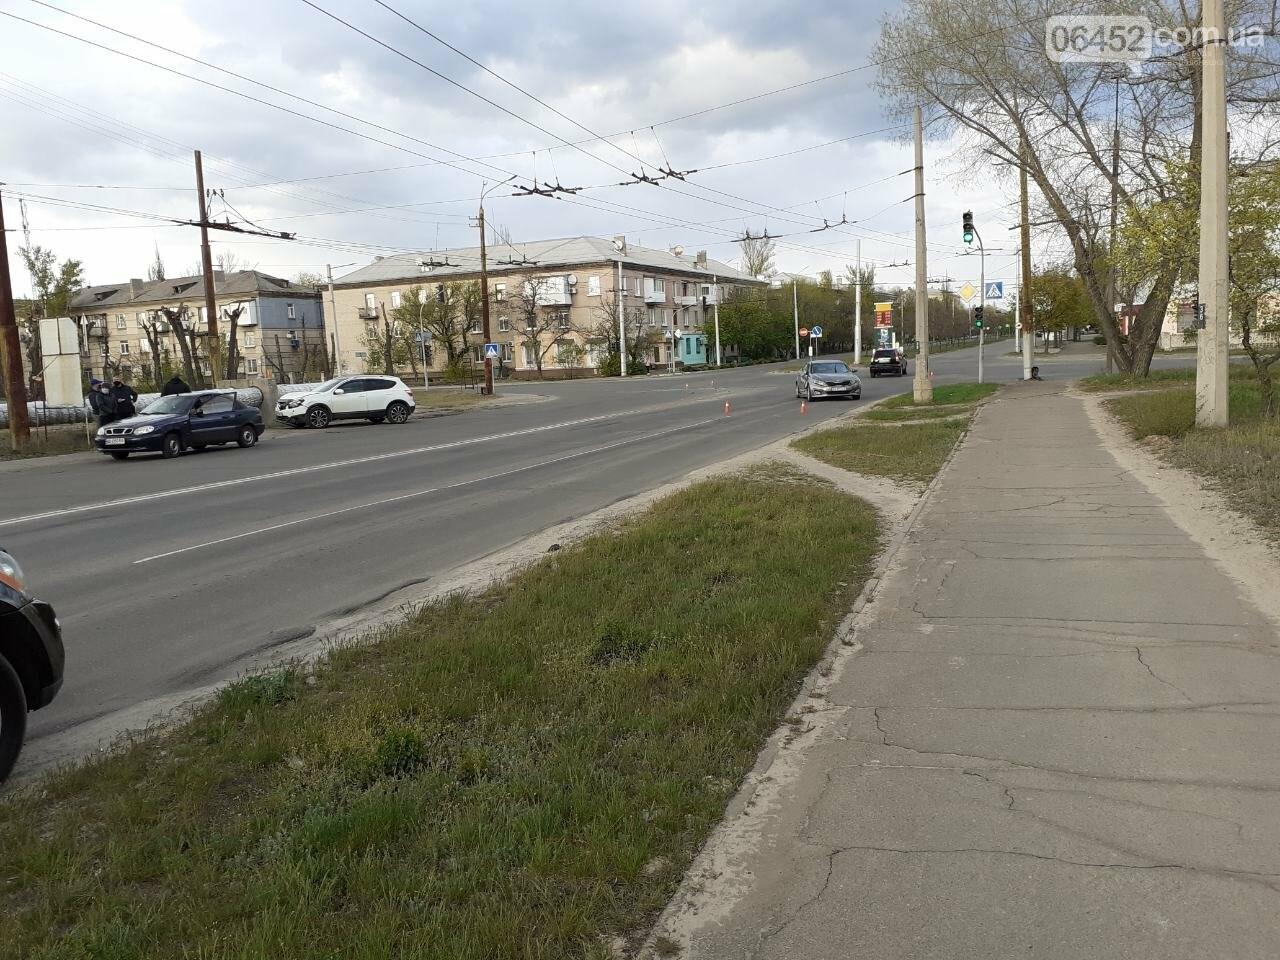 В Северодонецке столкнулись два автомобиля, фото-1